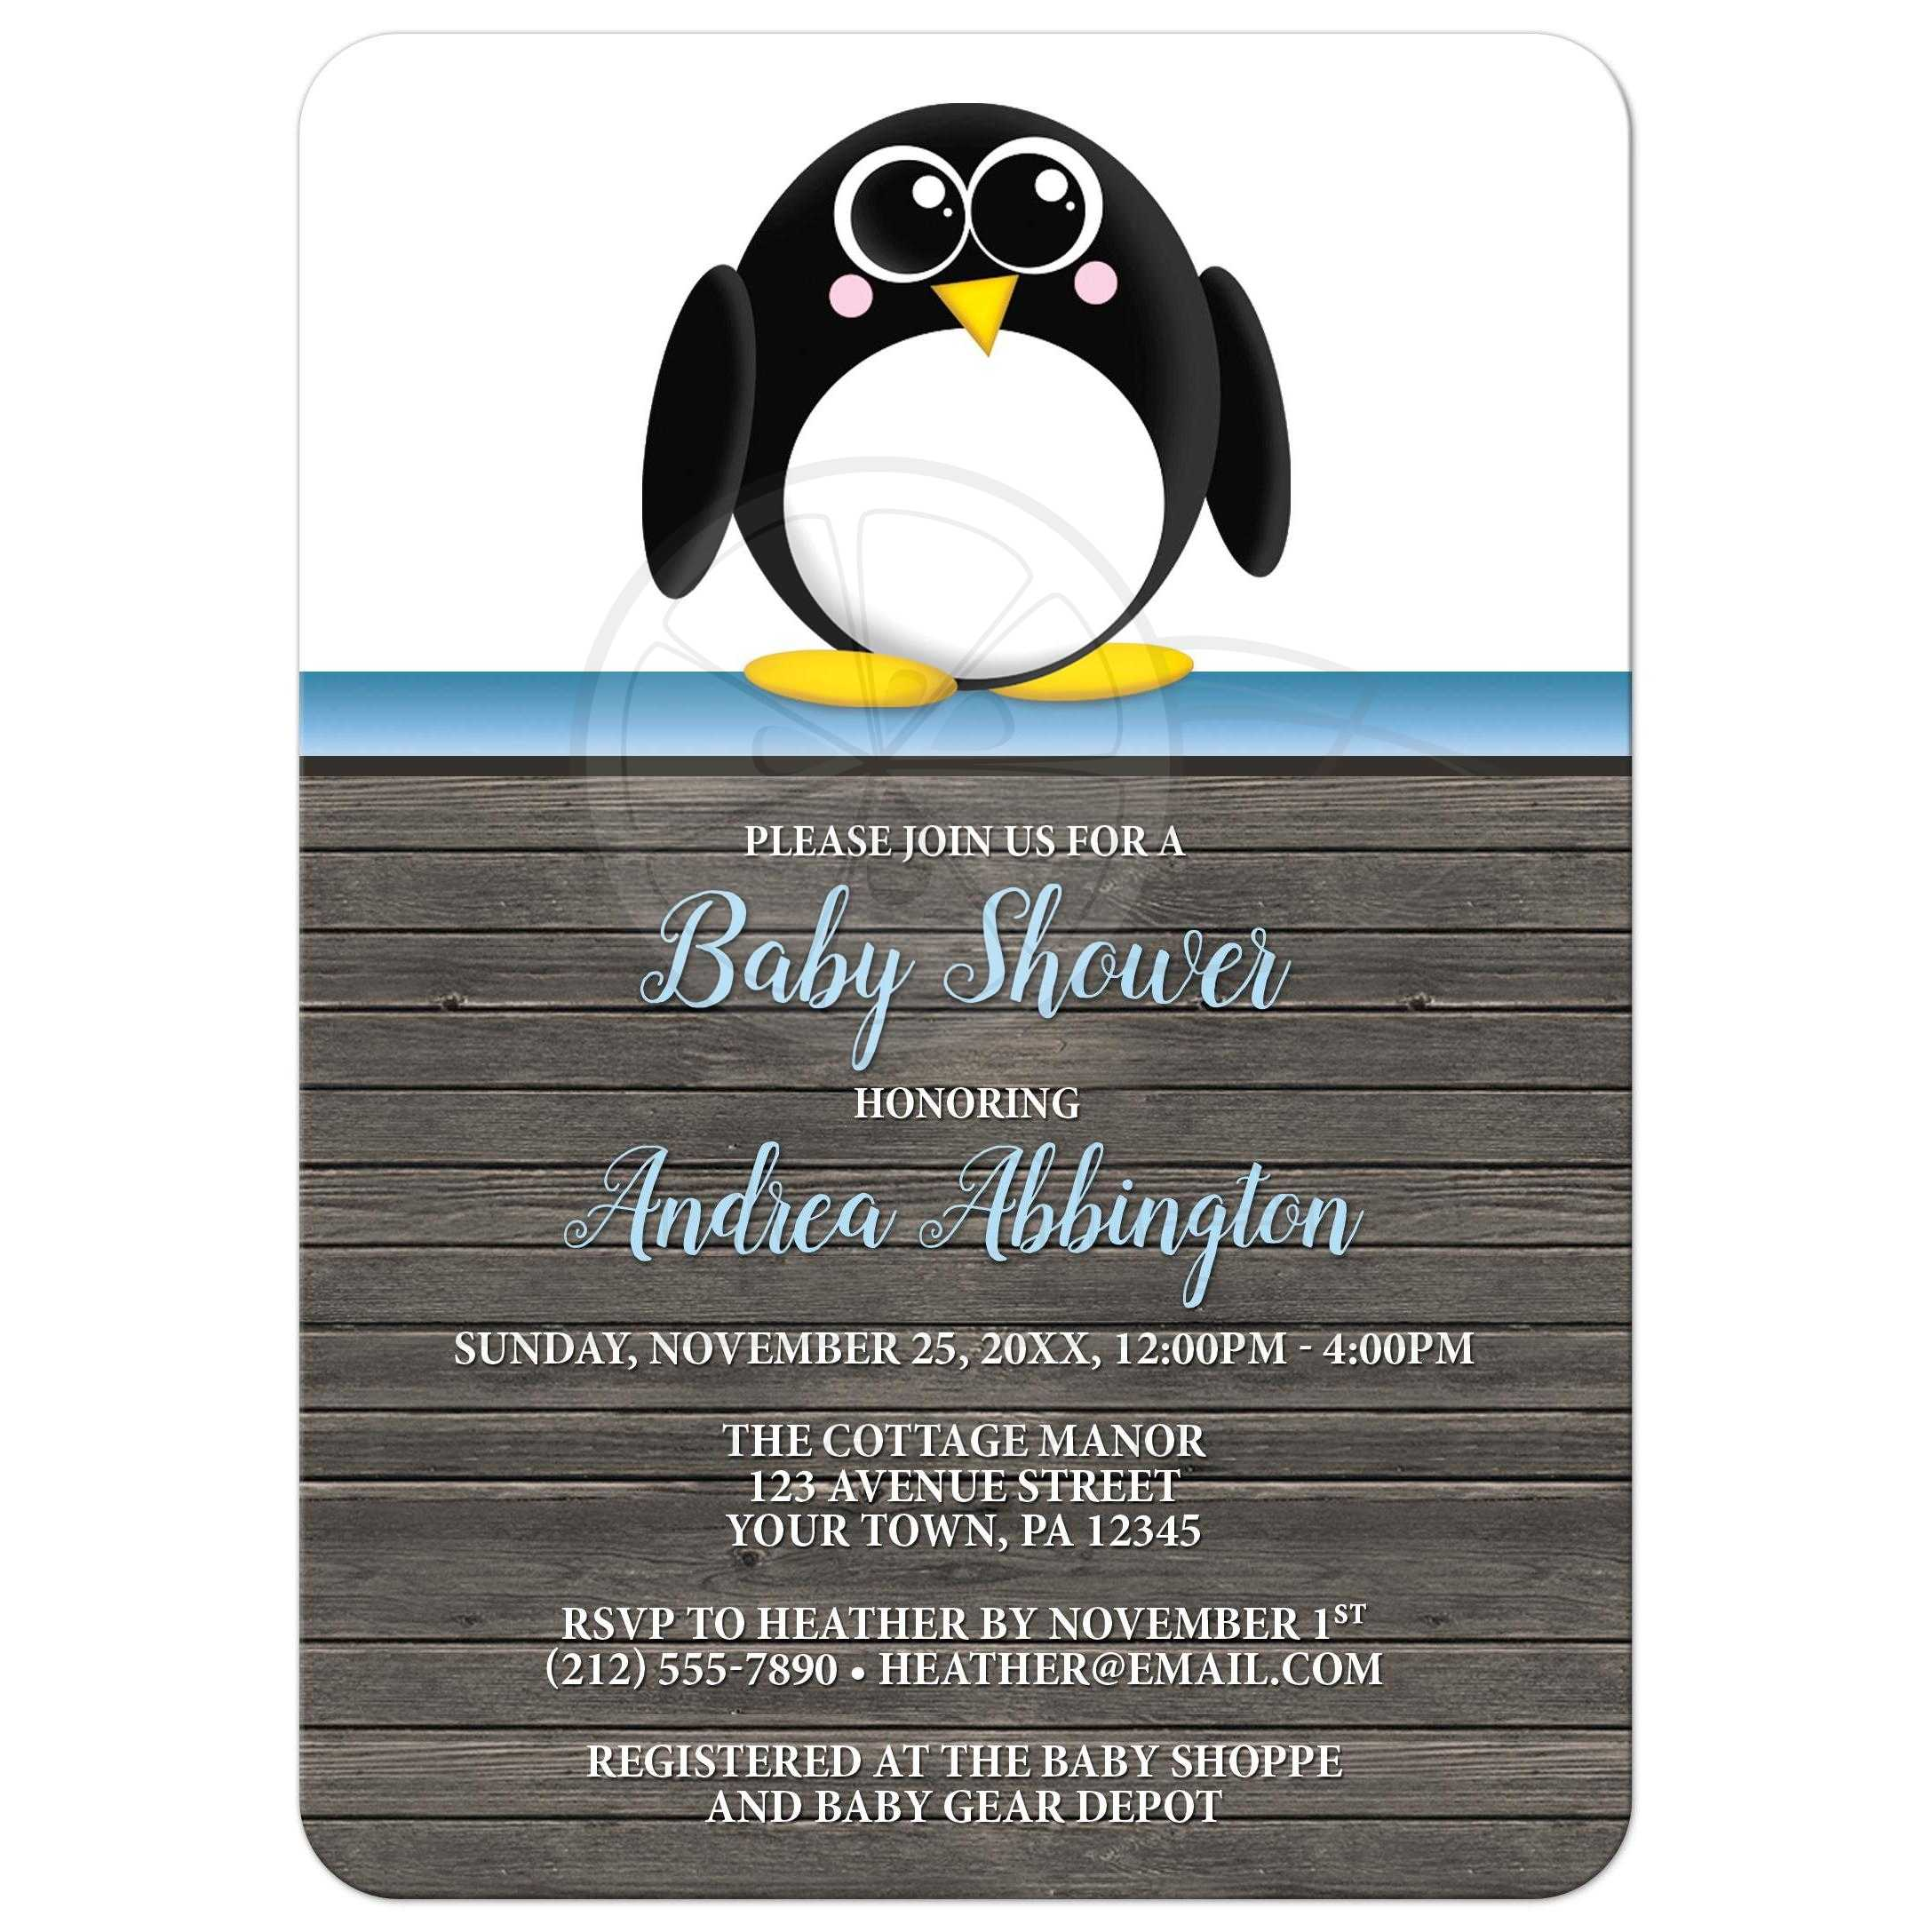 Shower Invitations - Cute Penguin Blue Rustic Brown Wood